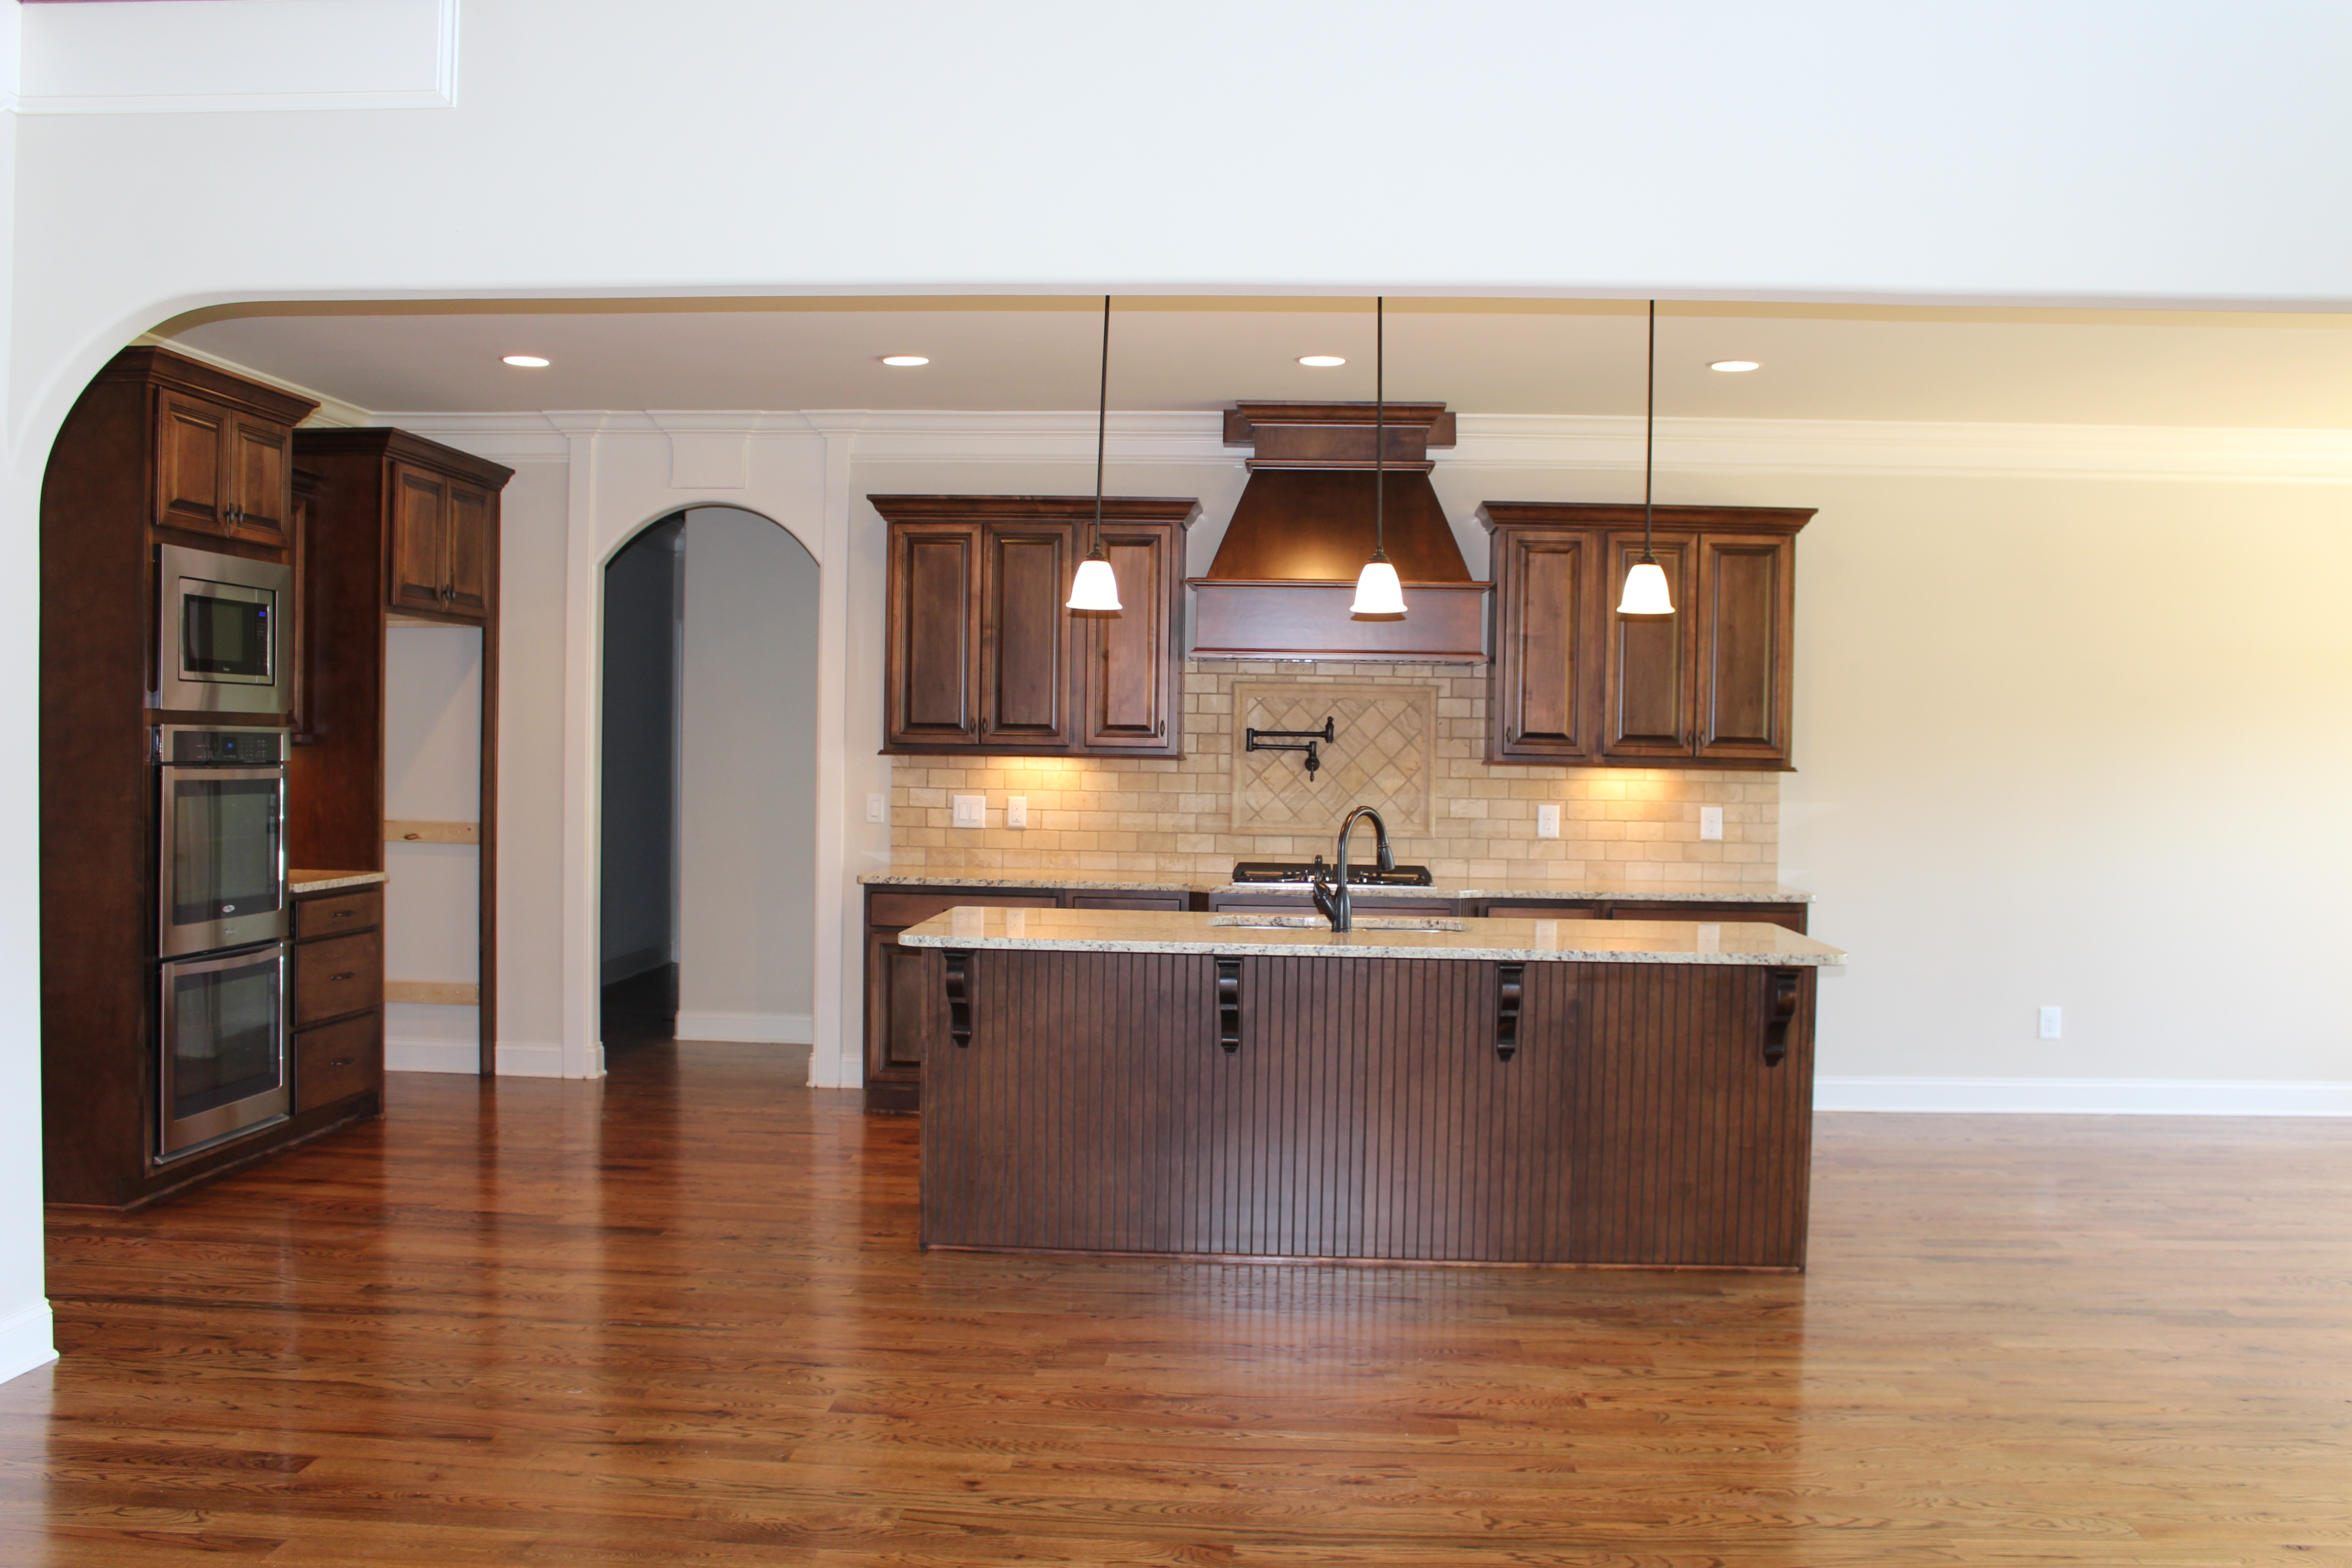 Lot 162 AR kitchen